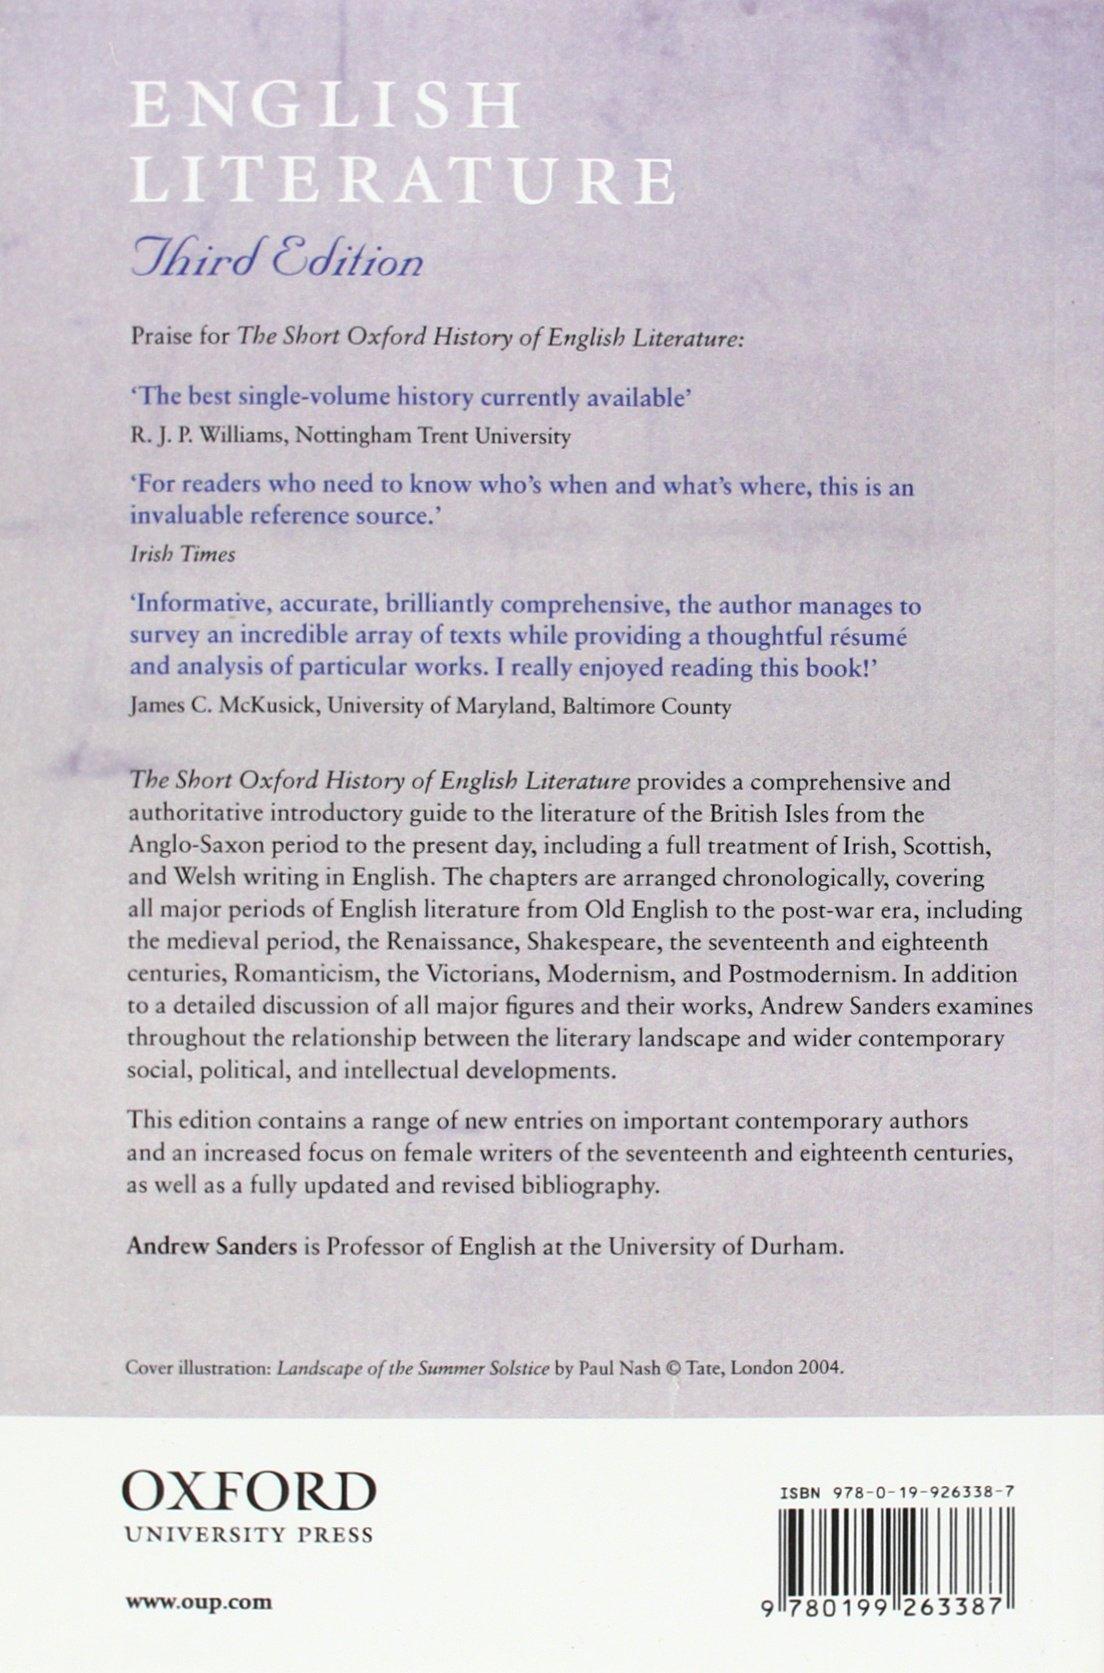 Amazon.com: The Short Oxford History of English Literature ...